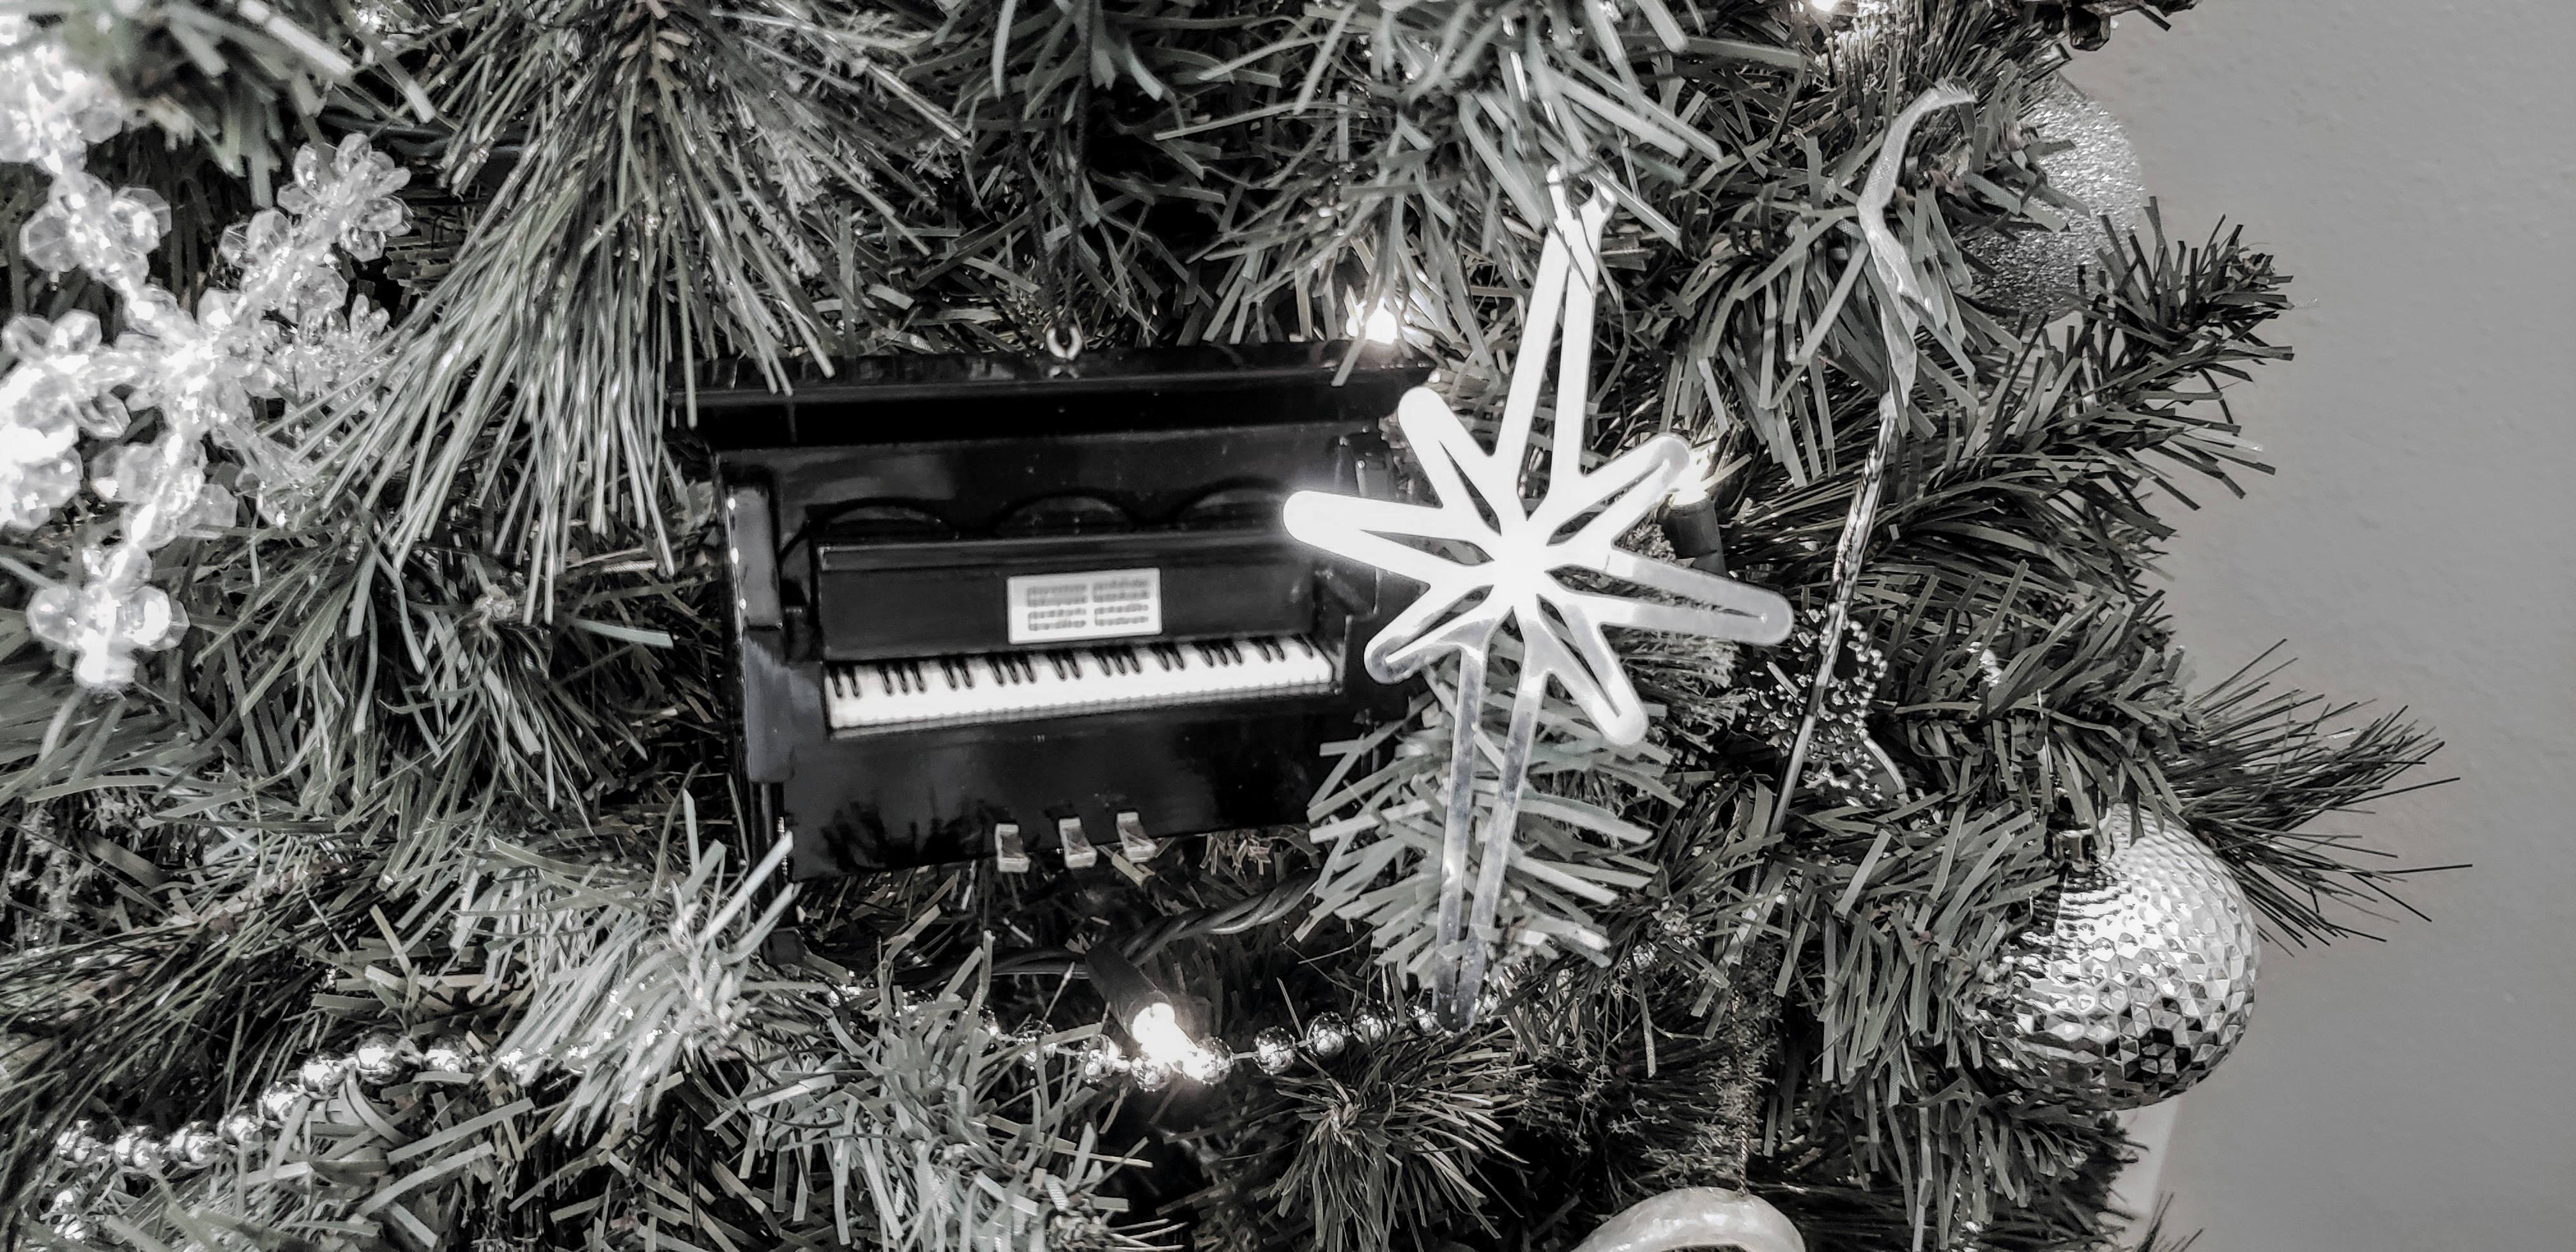 Light the world tree ornament